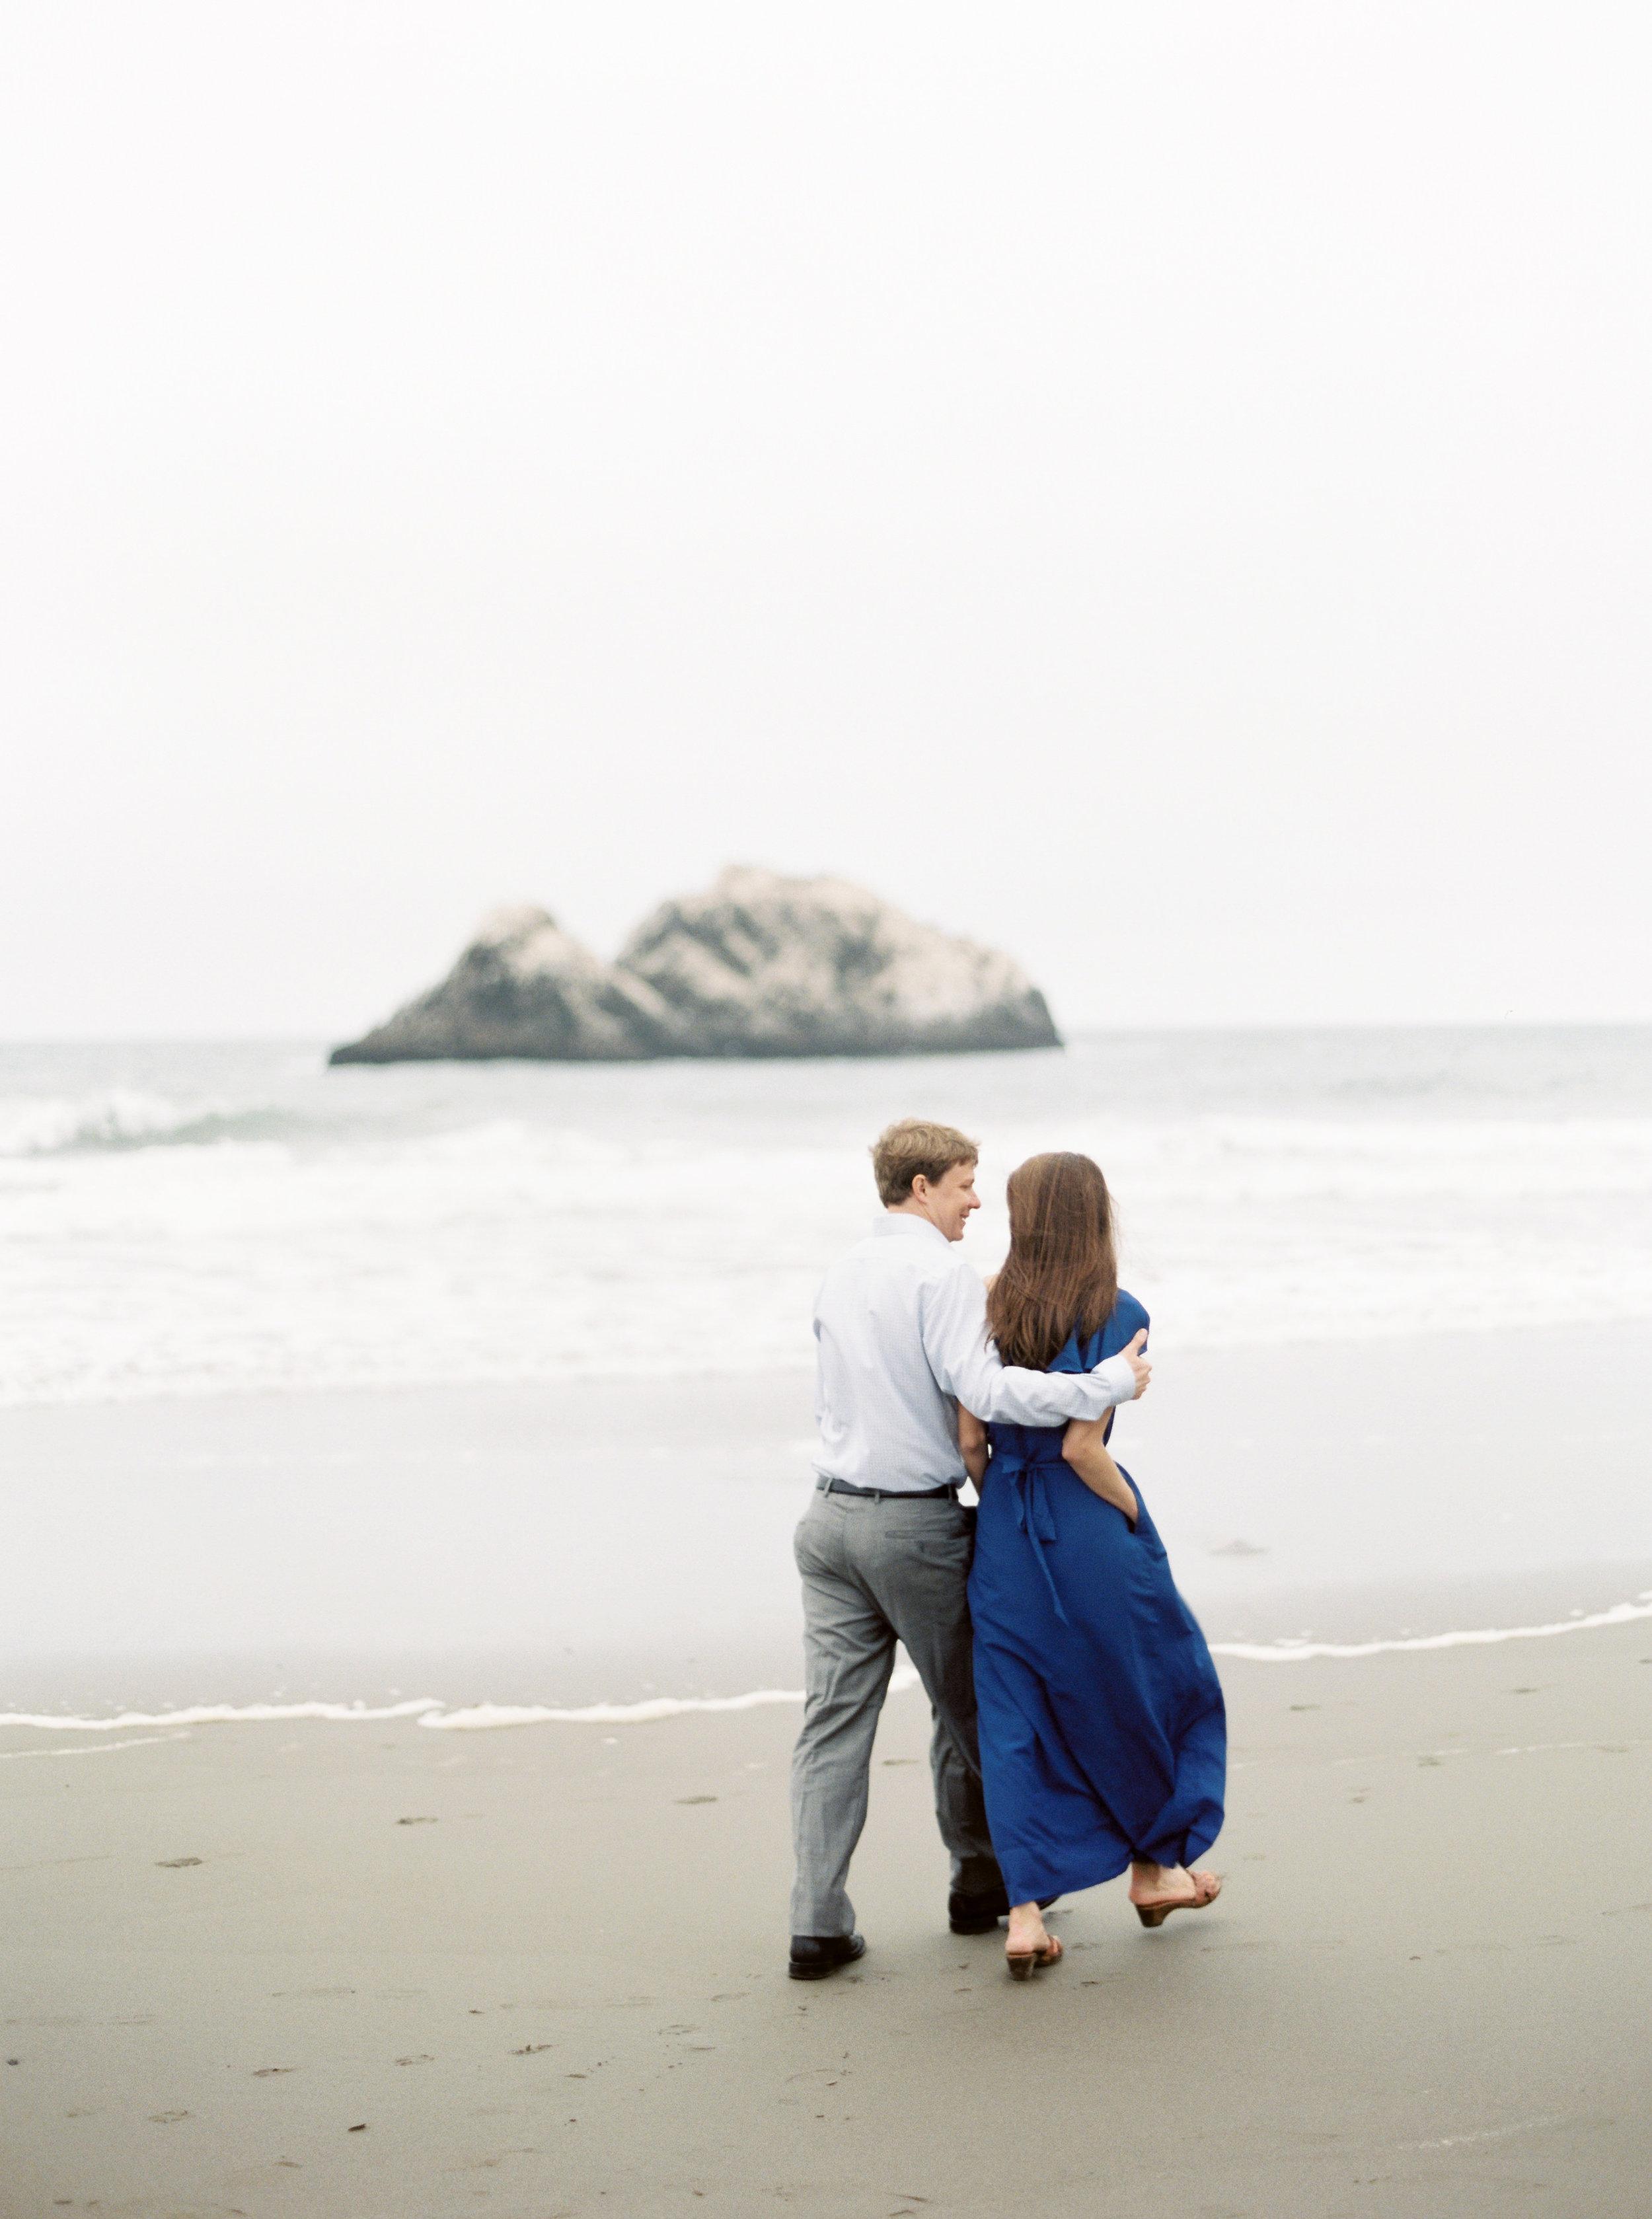 sutro-baths-san-francisco-california-engagement-23.jpg